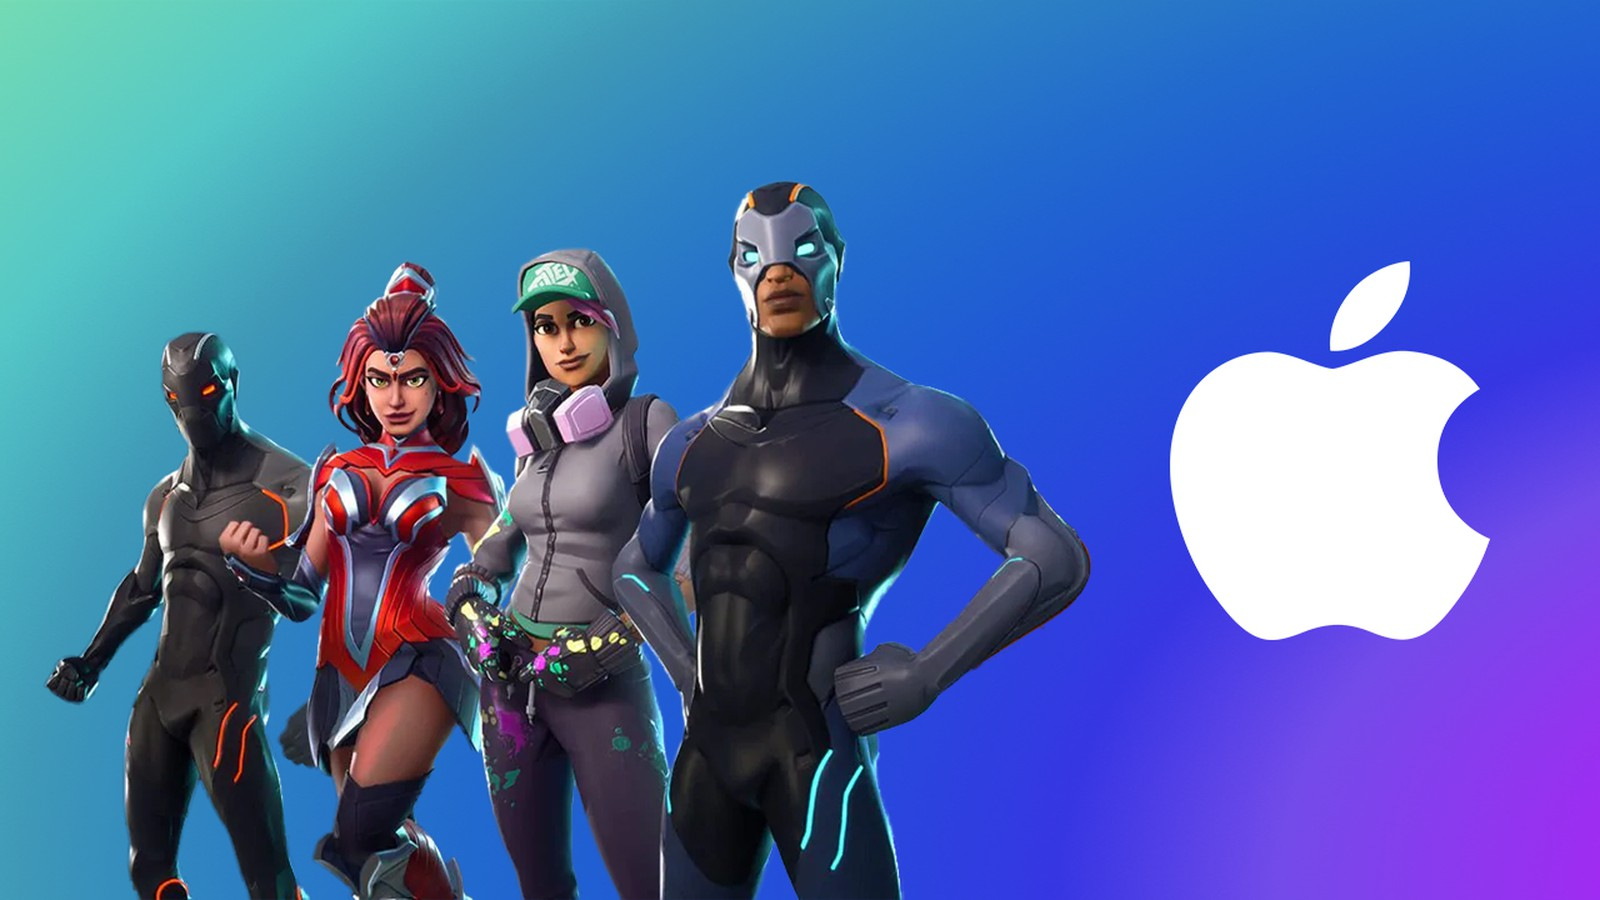 fortnite apple - Apple حساب توسعه دهنده ی Epic Games  را می بندد!